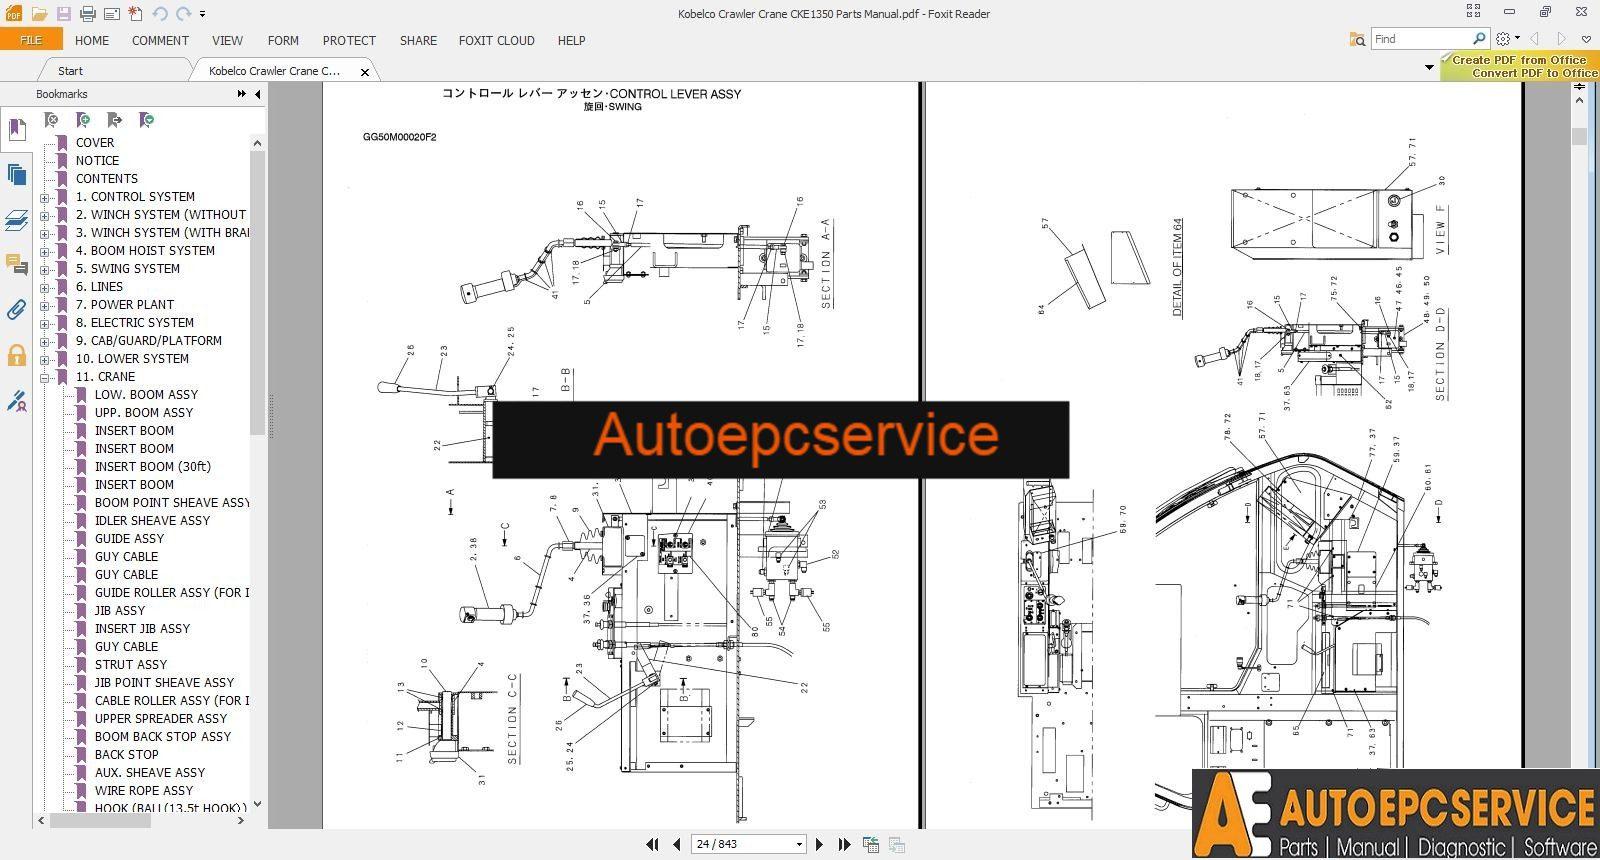 Kobelco_Crane_Shop_Manual_Operator_Maintenance_Manual7zvNem (2)